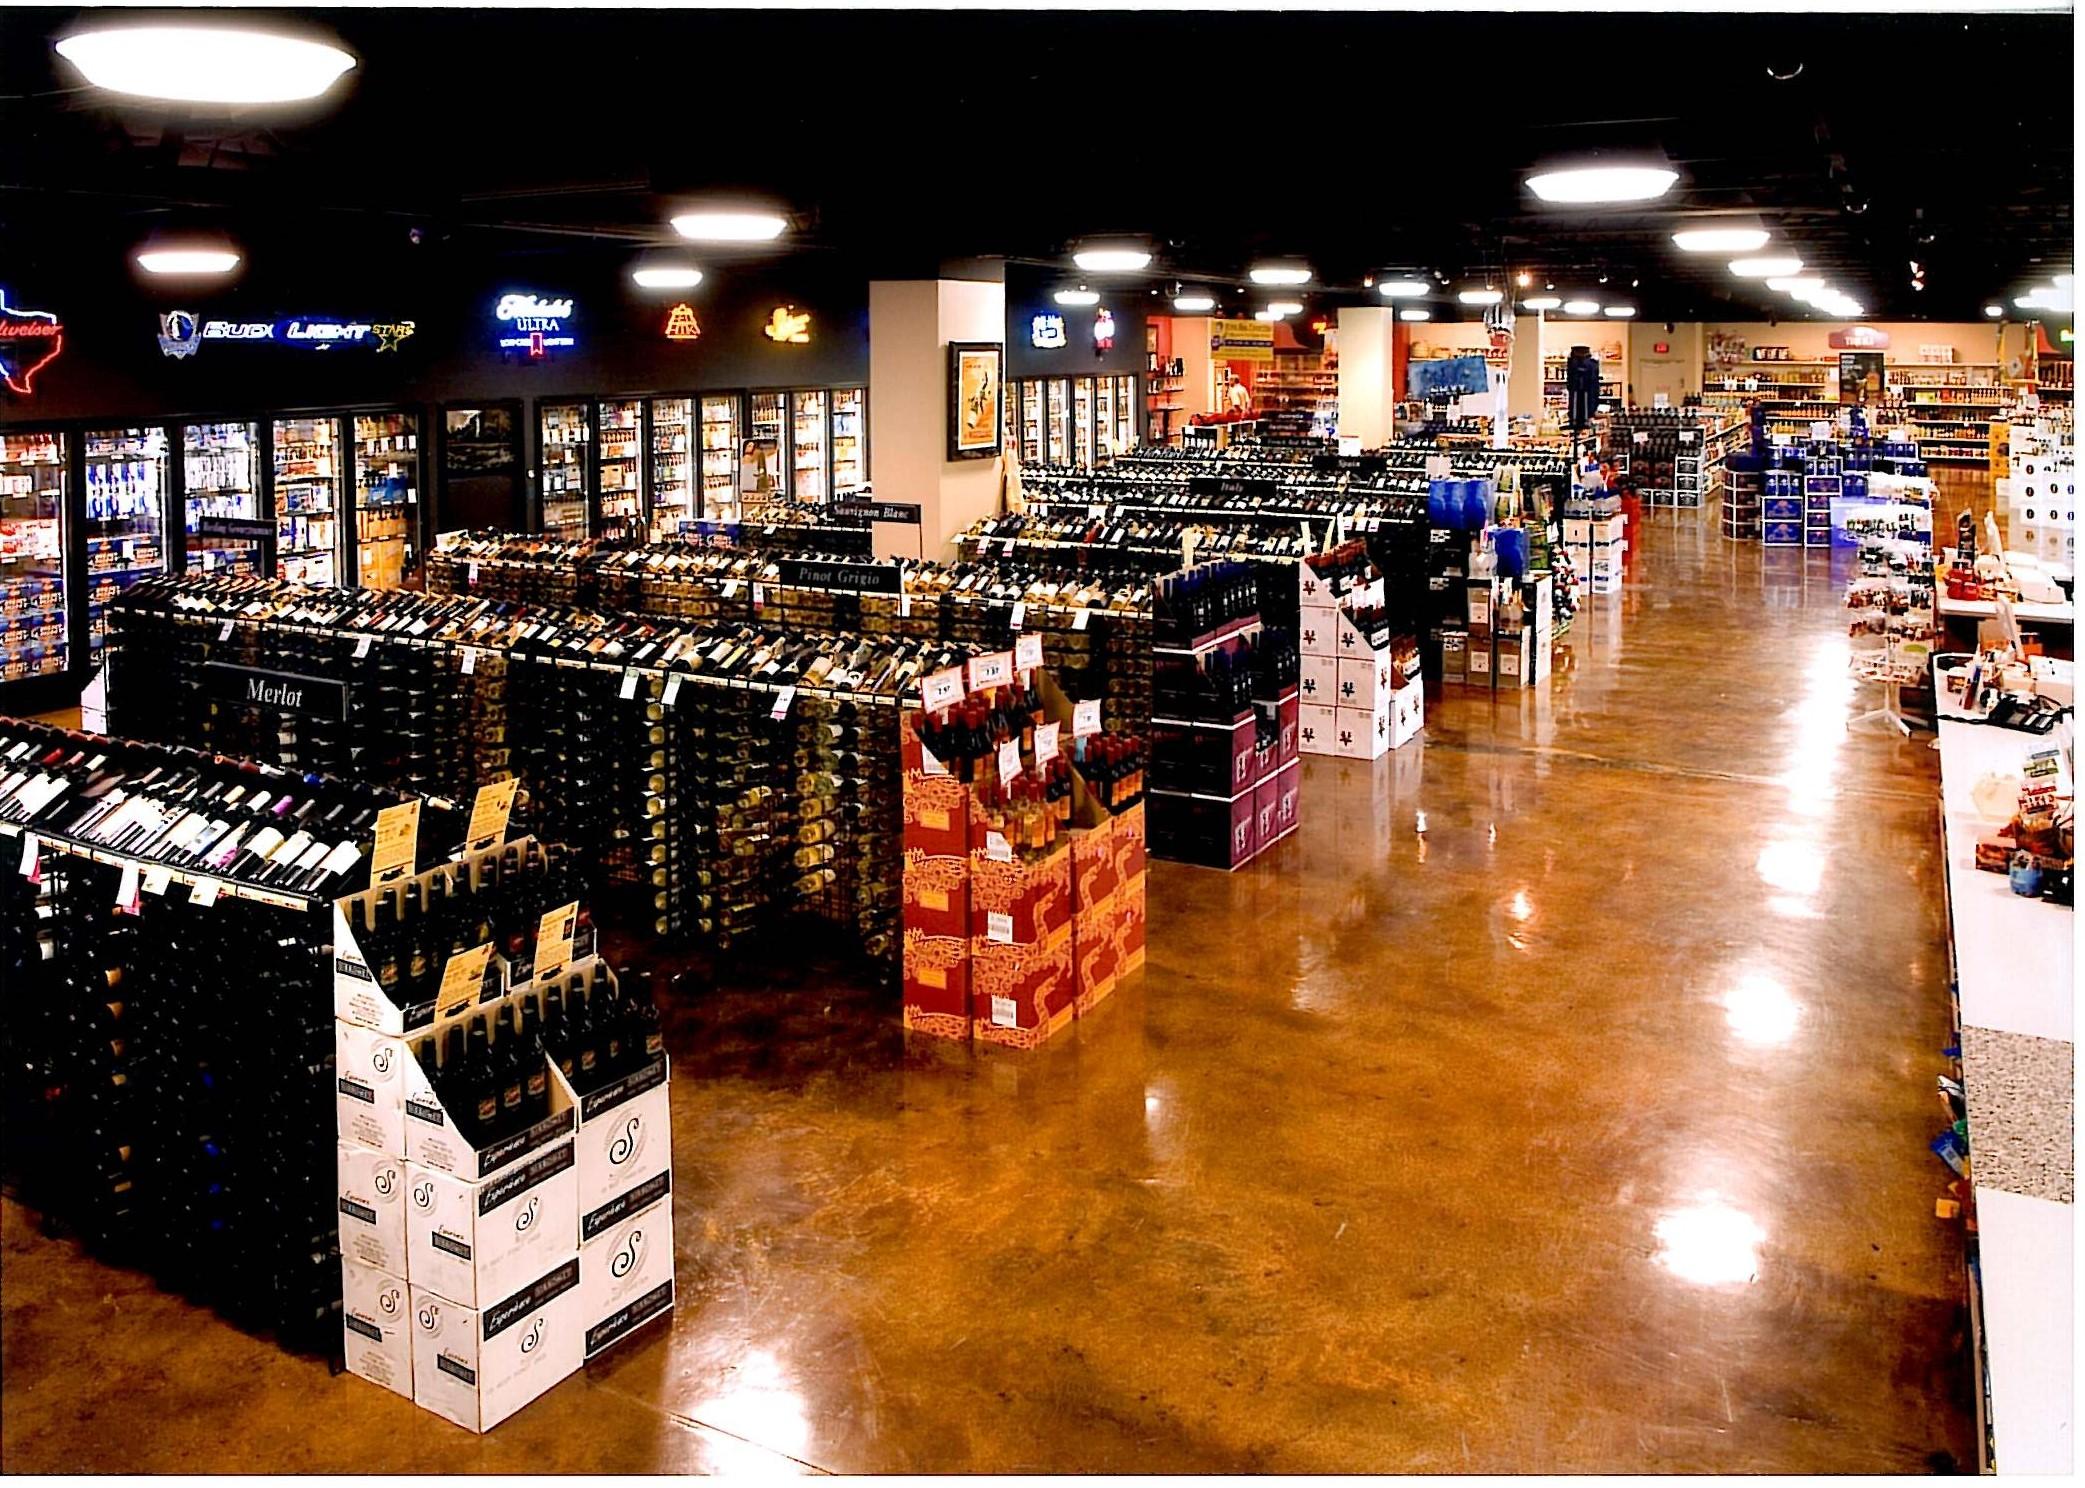 MAJESTIC LIQUOR - Liquor Store Design Services by JayComp Development (22)